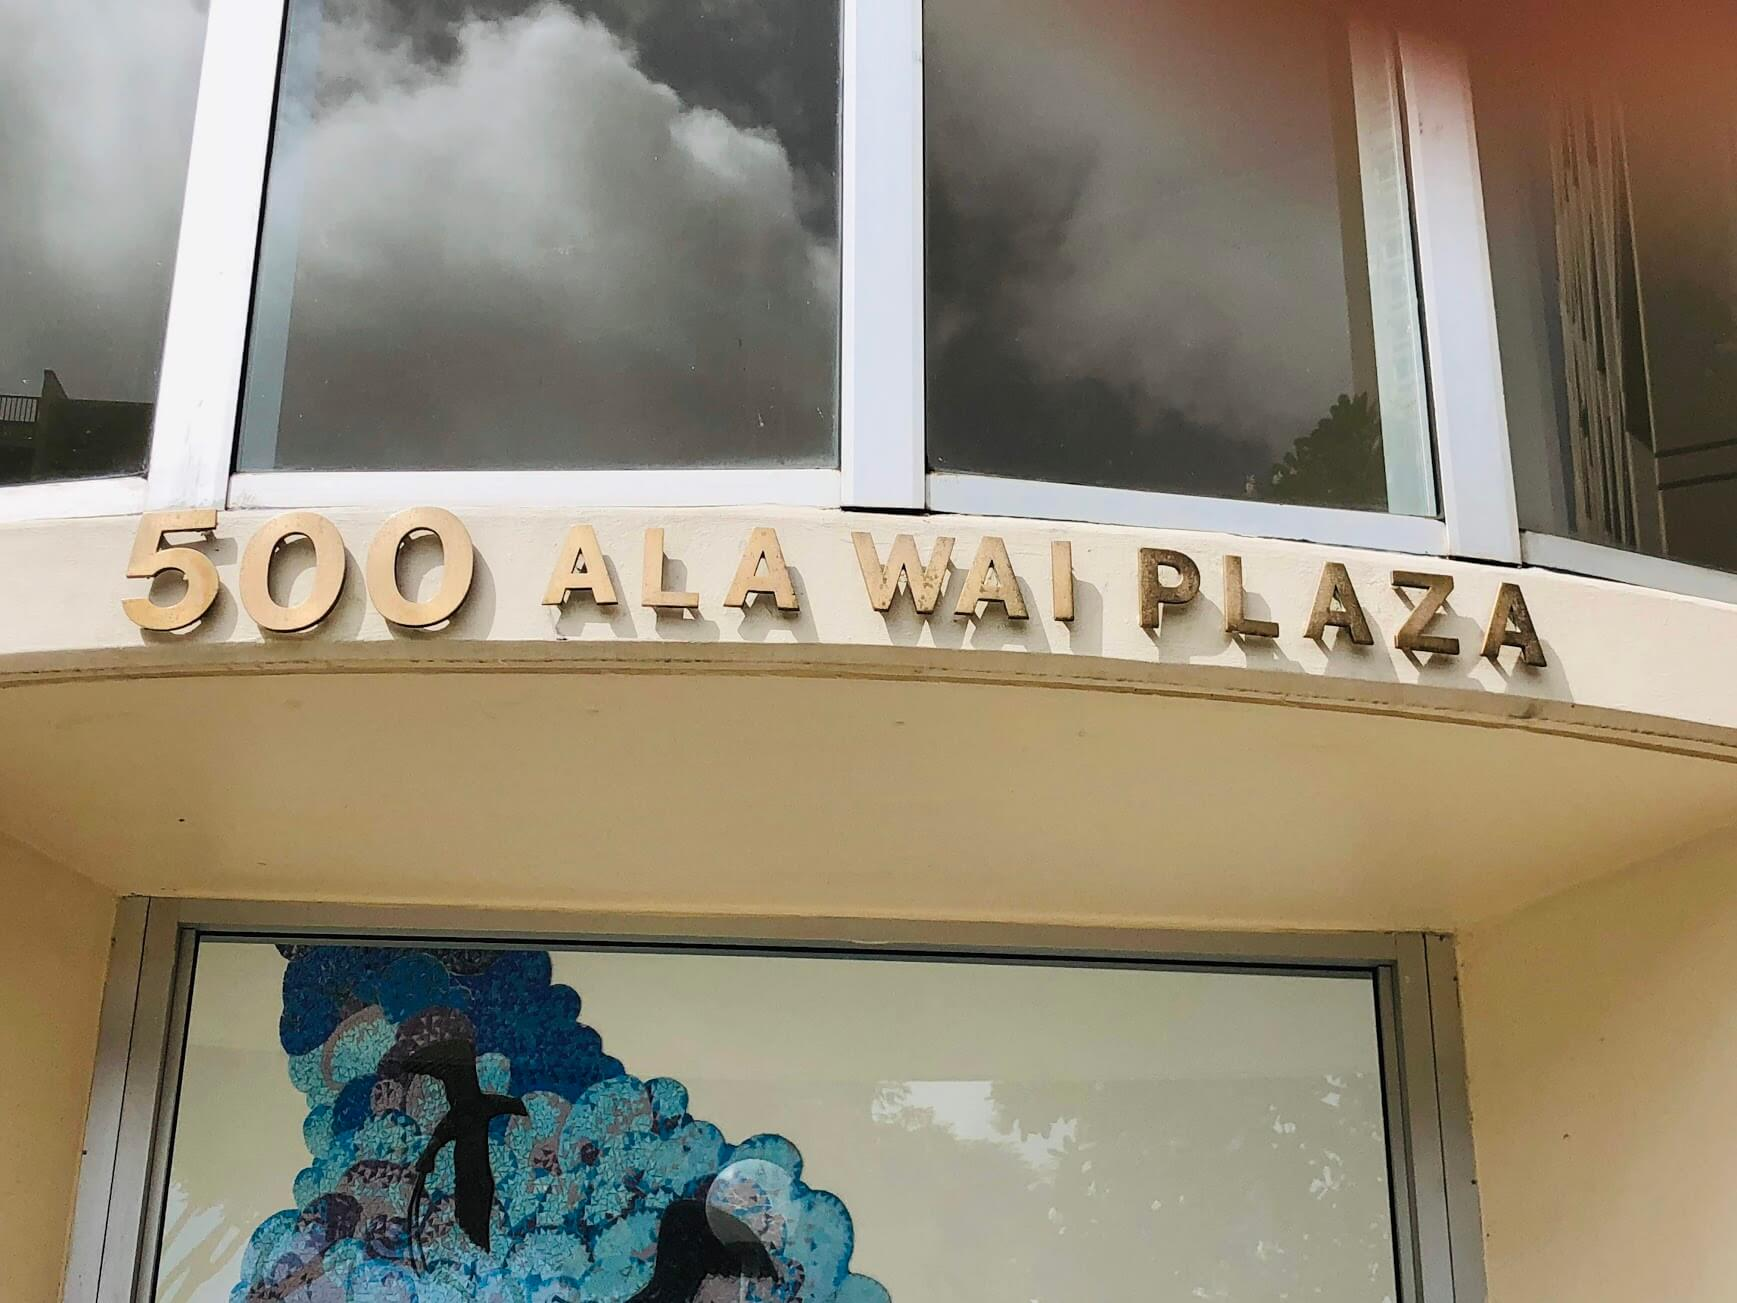 500 Ala Wai Plazaの看板